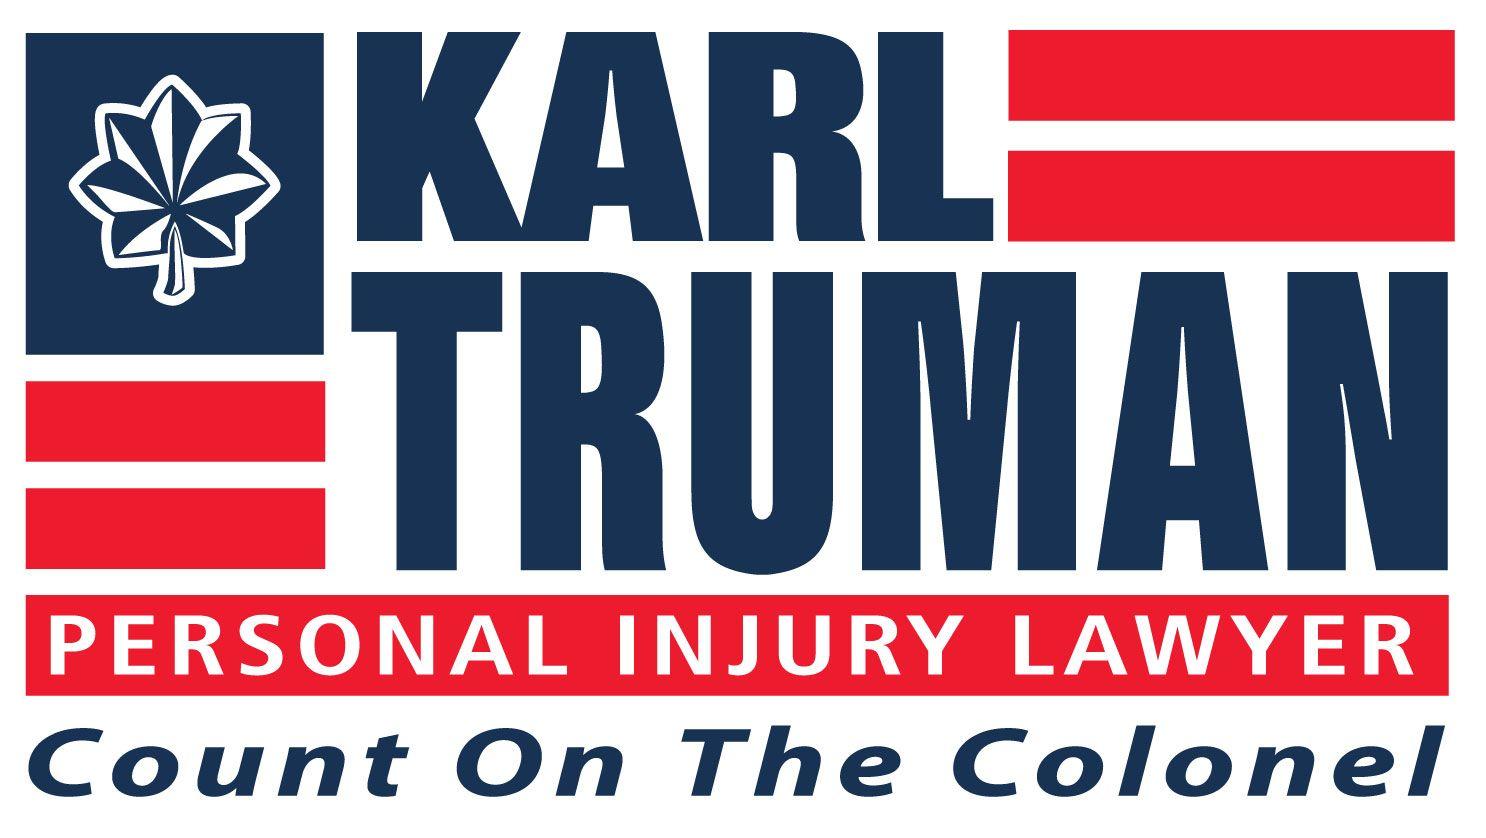 Karl Truman Law Office LLC - ad image